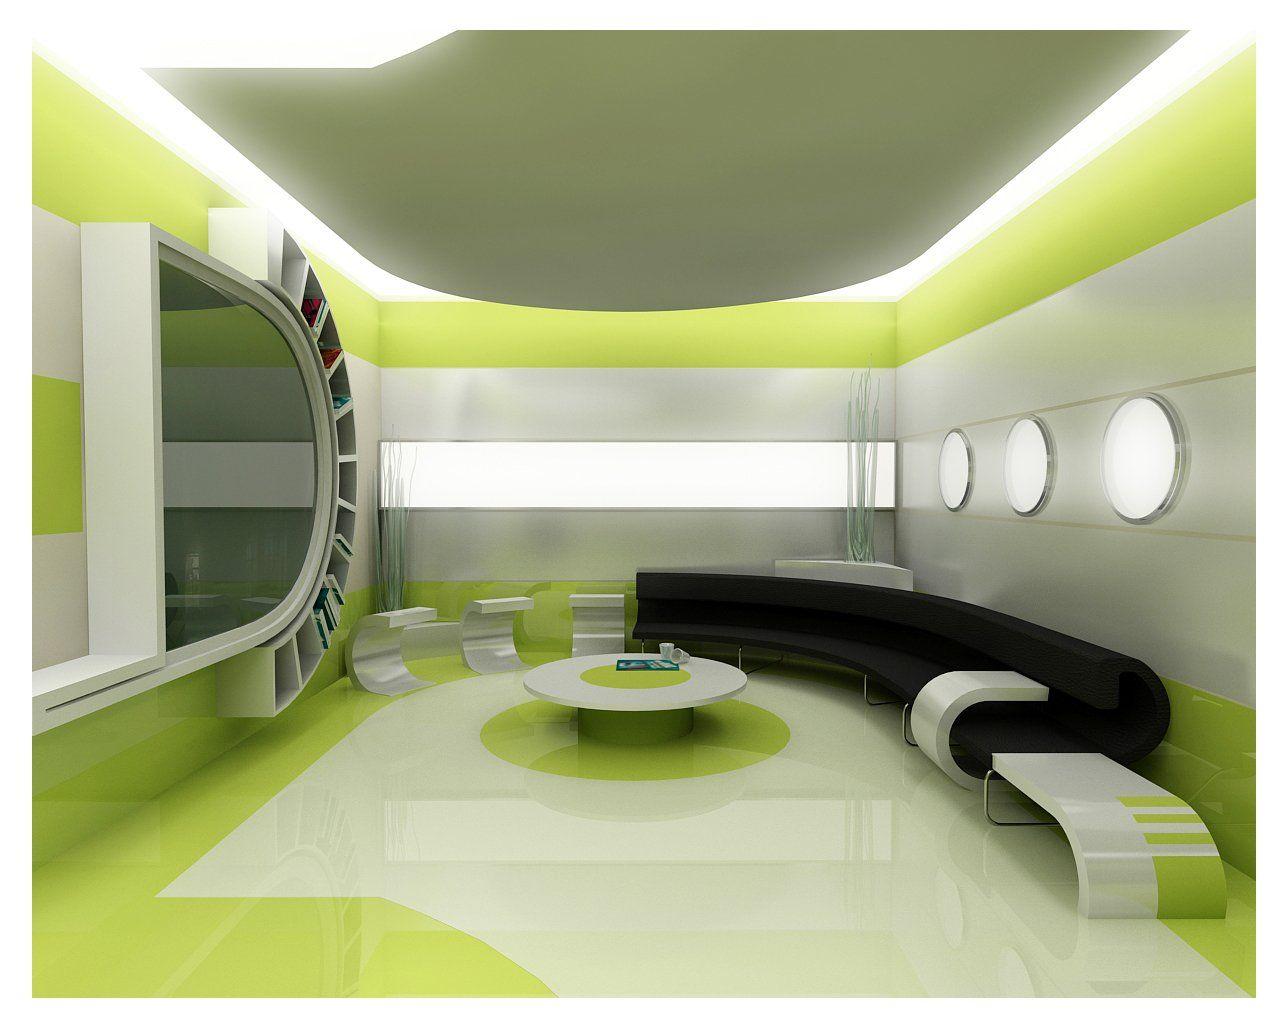 decoration design ... interior design and decoration 15 stunning incredible interior design  and decoration VDDLDPC